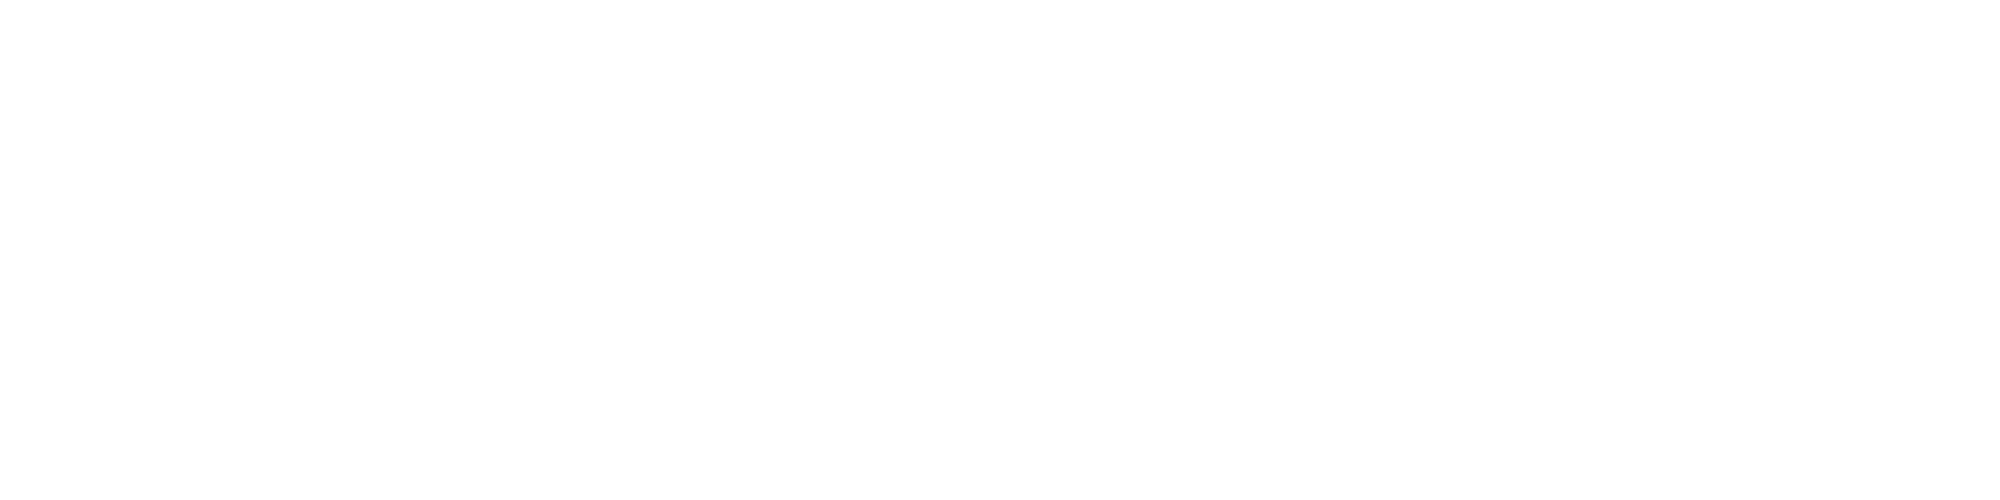 Delahaye Studio logo